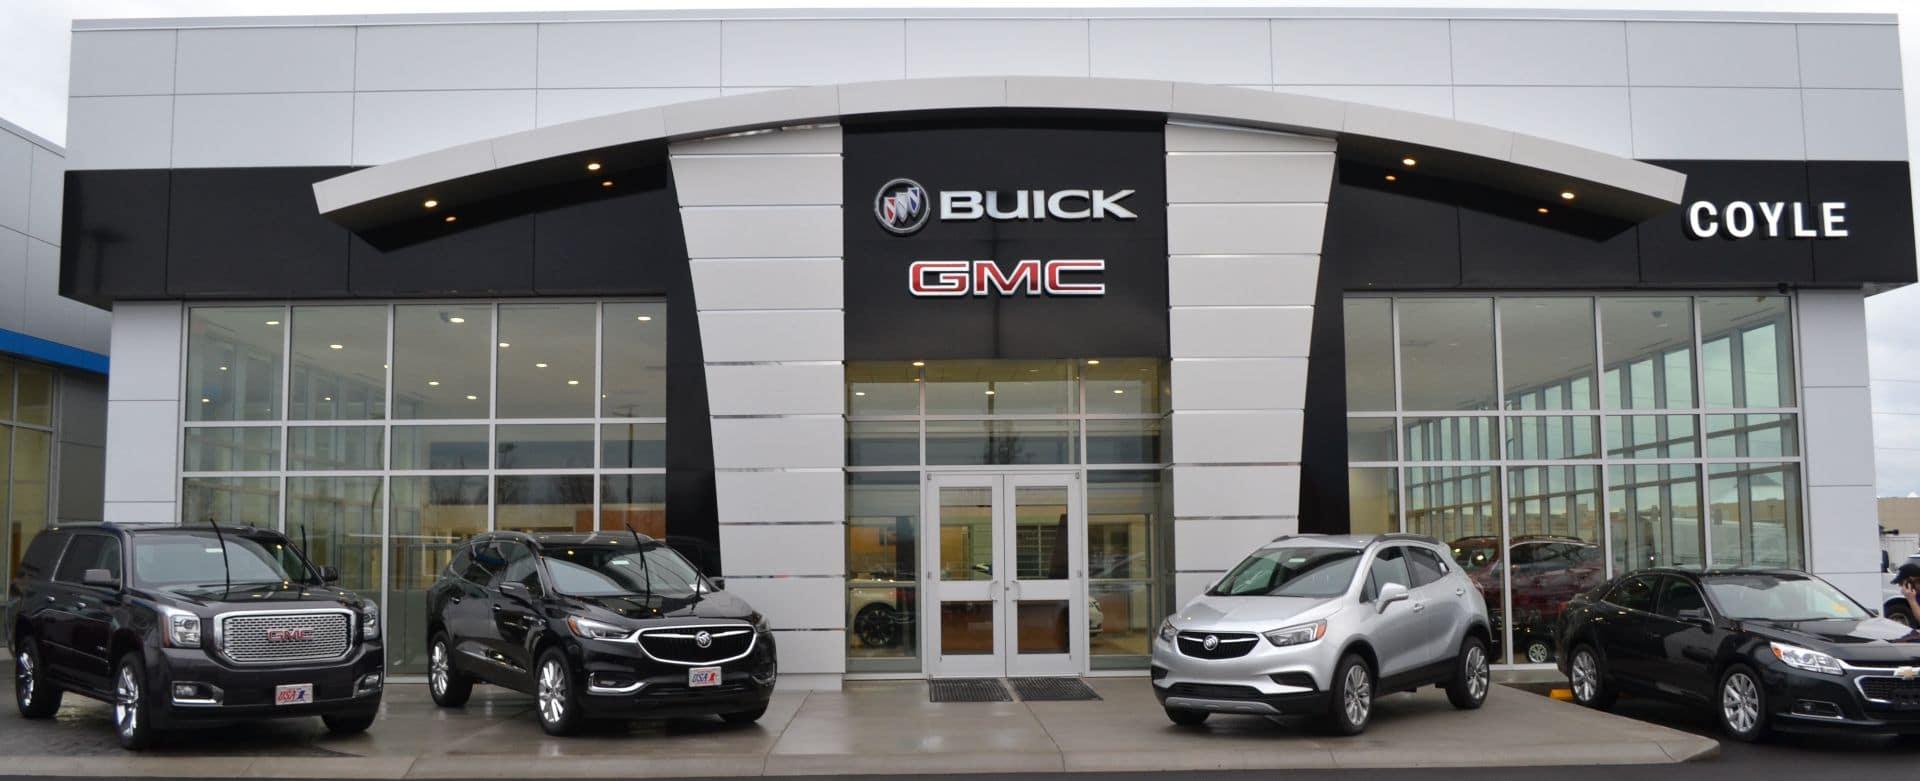 Coyle Buick GMC